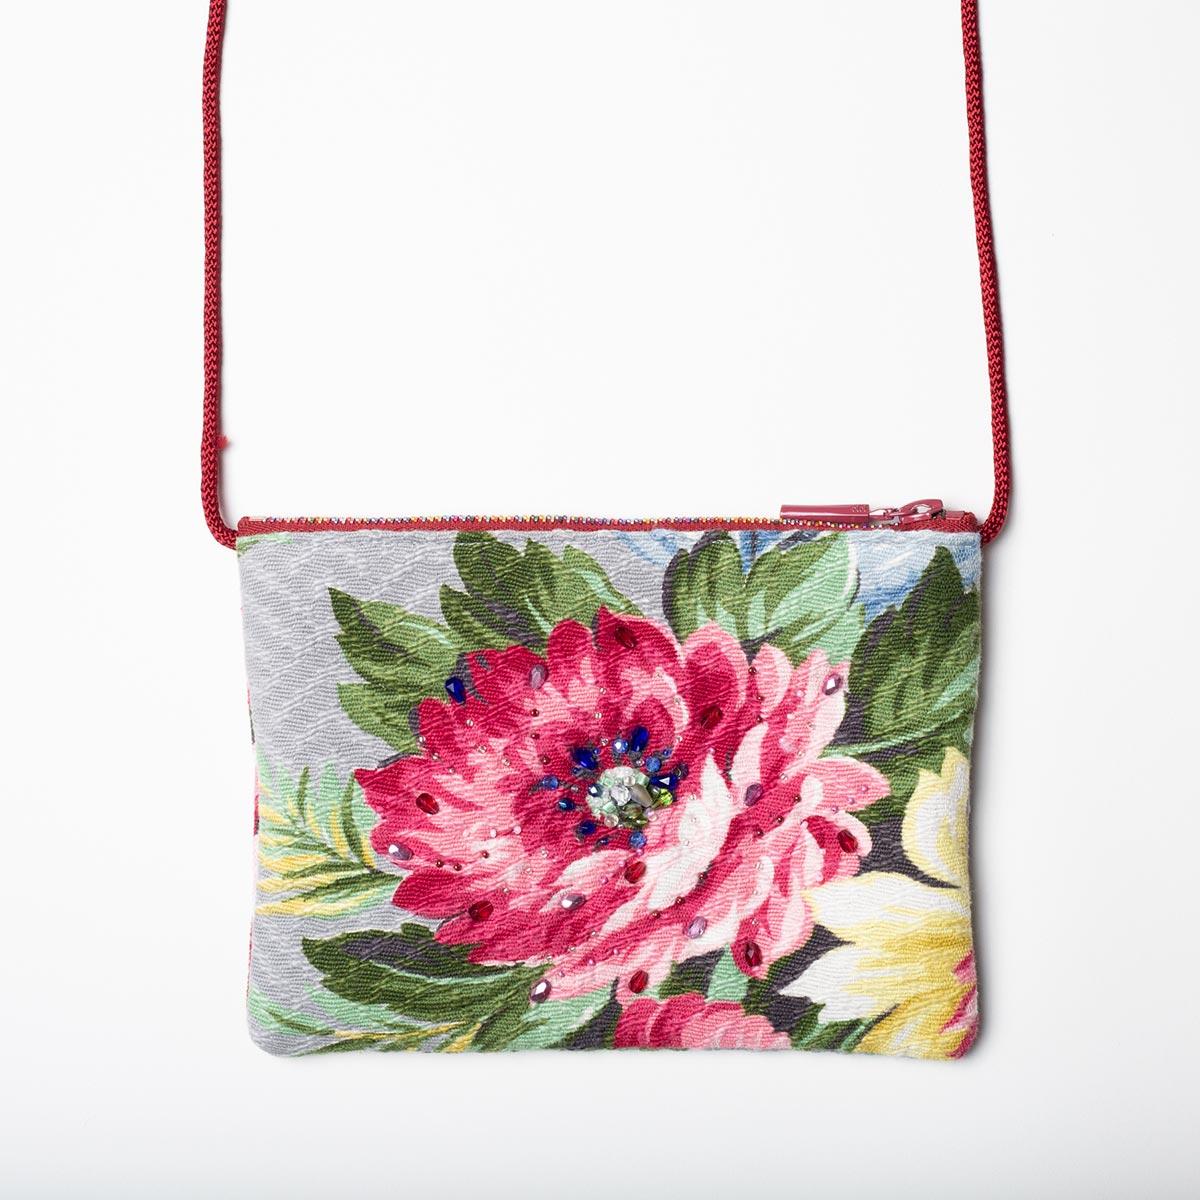 The Opera Bag – Garden Peony on Gray